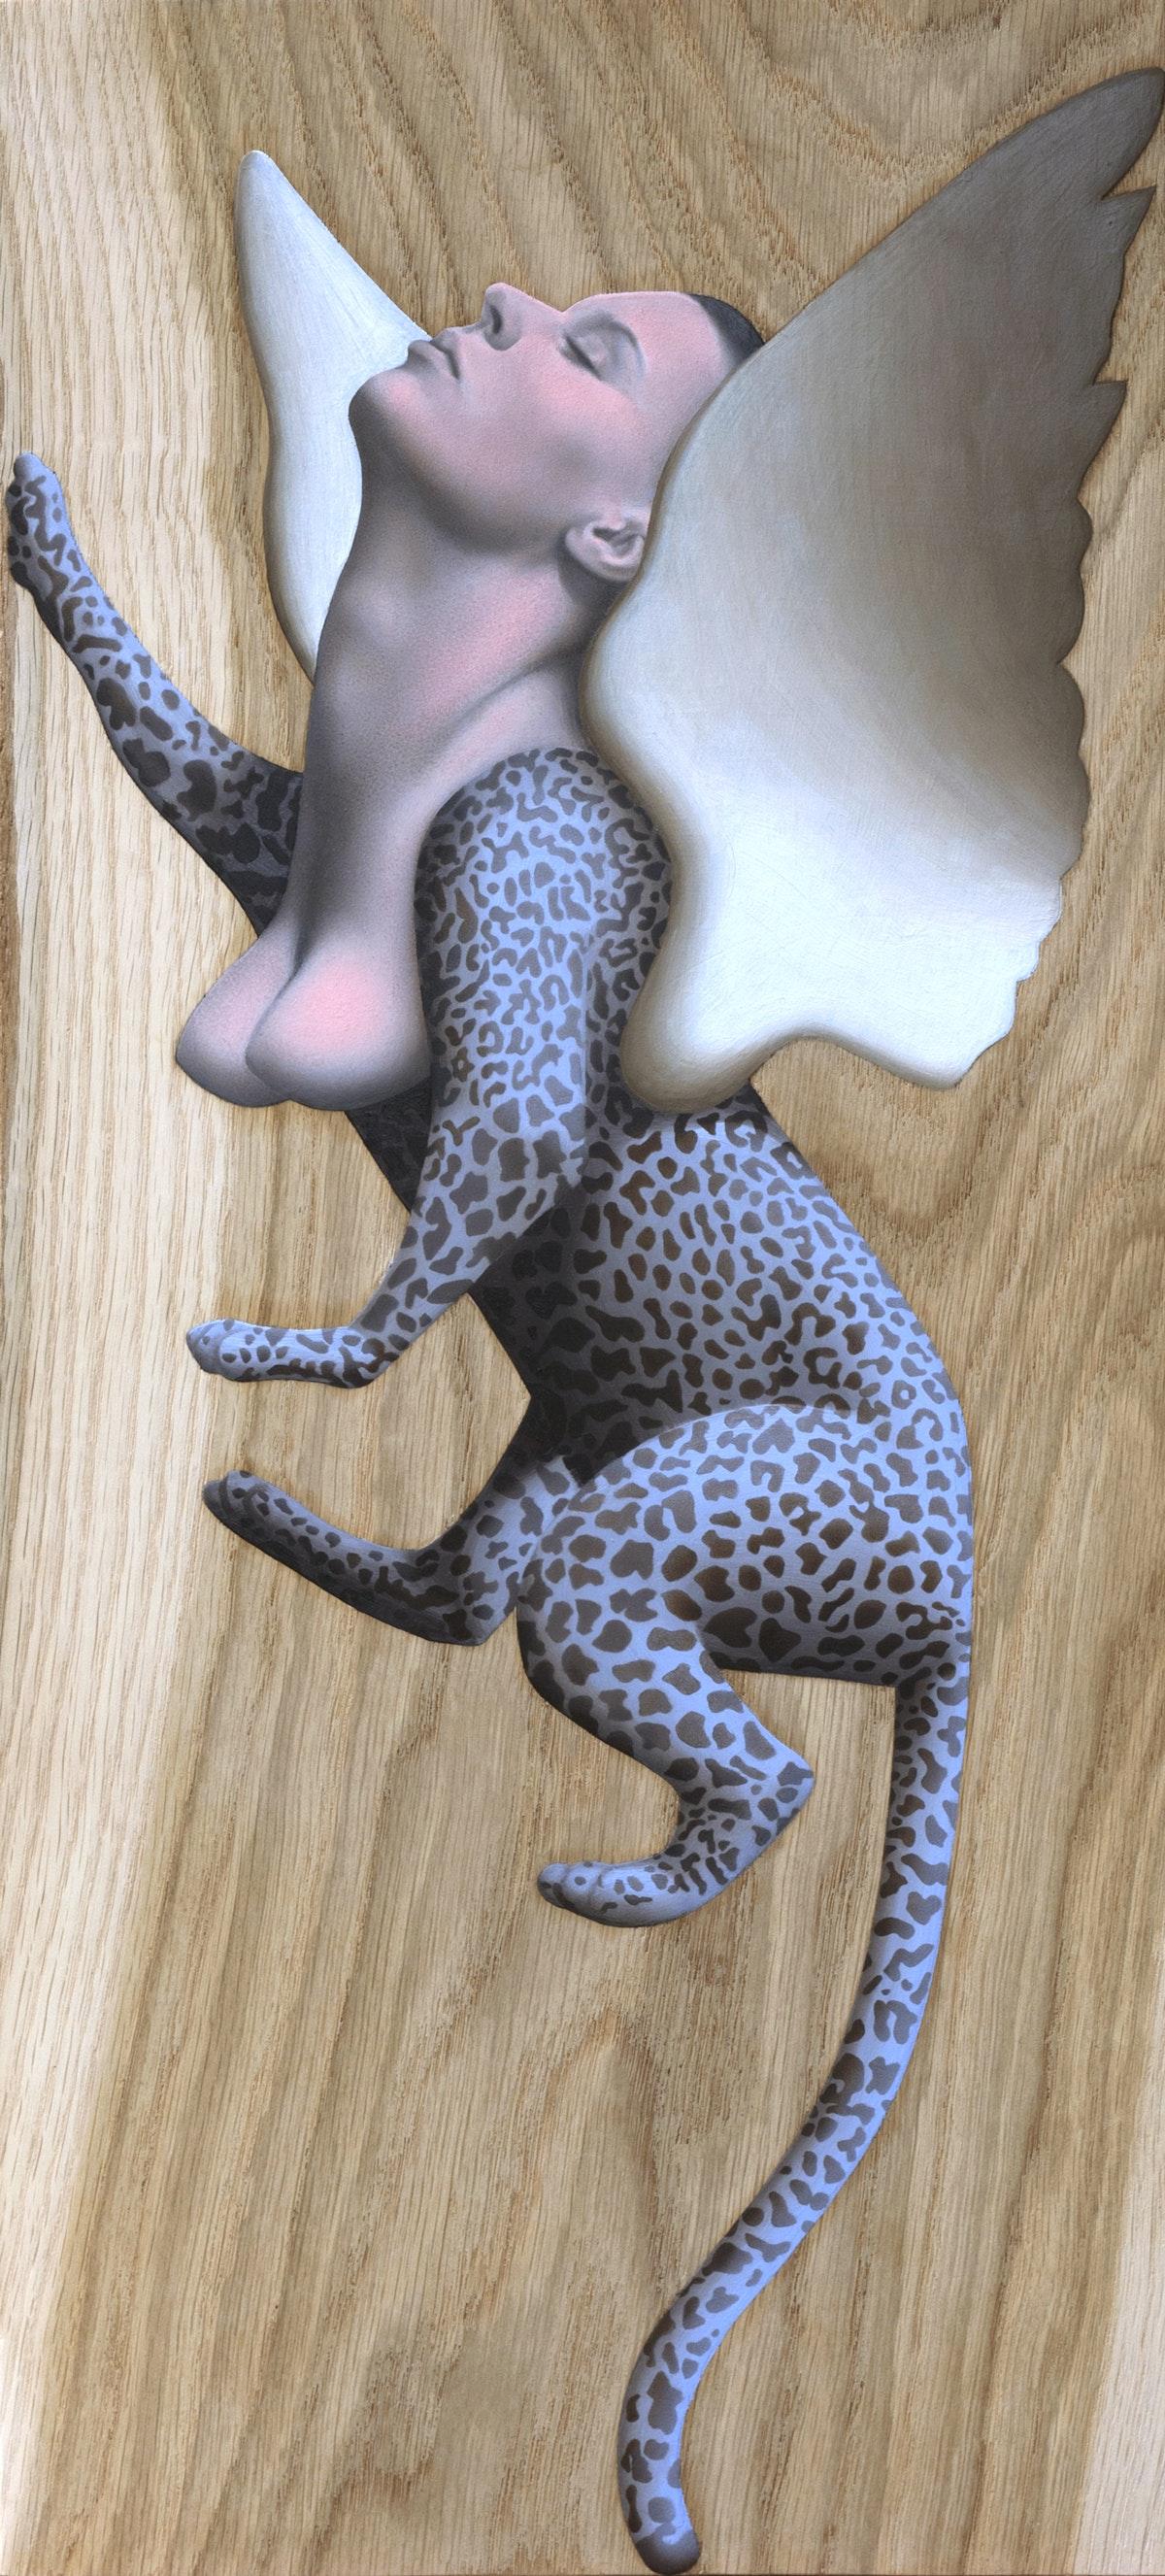 5Kle Mens, Sfinks, olej na desce, 24 x 54 cm, 2019